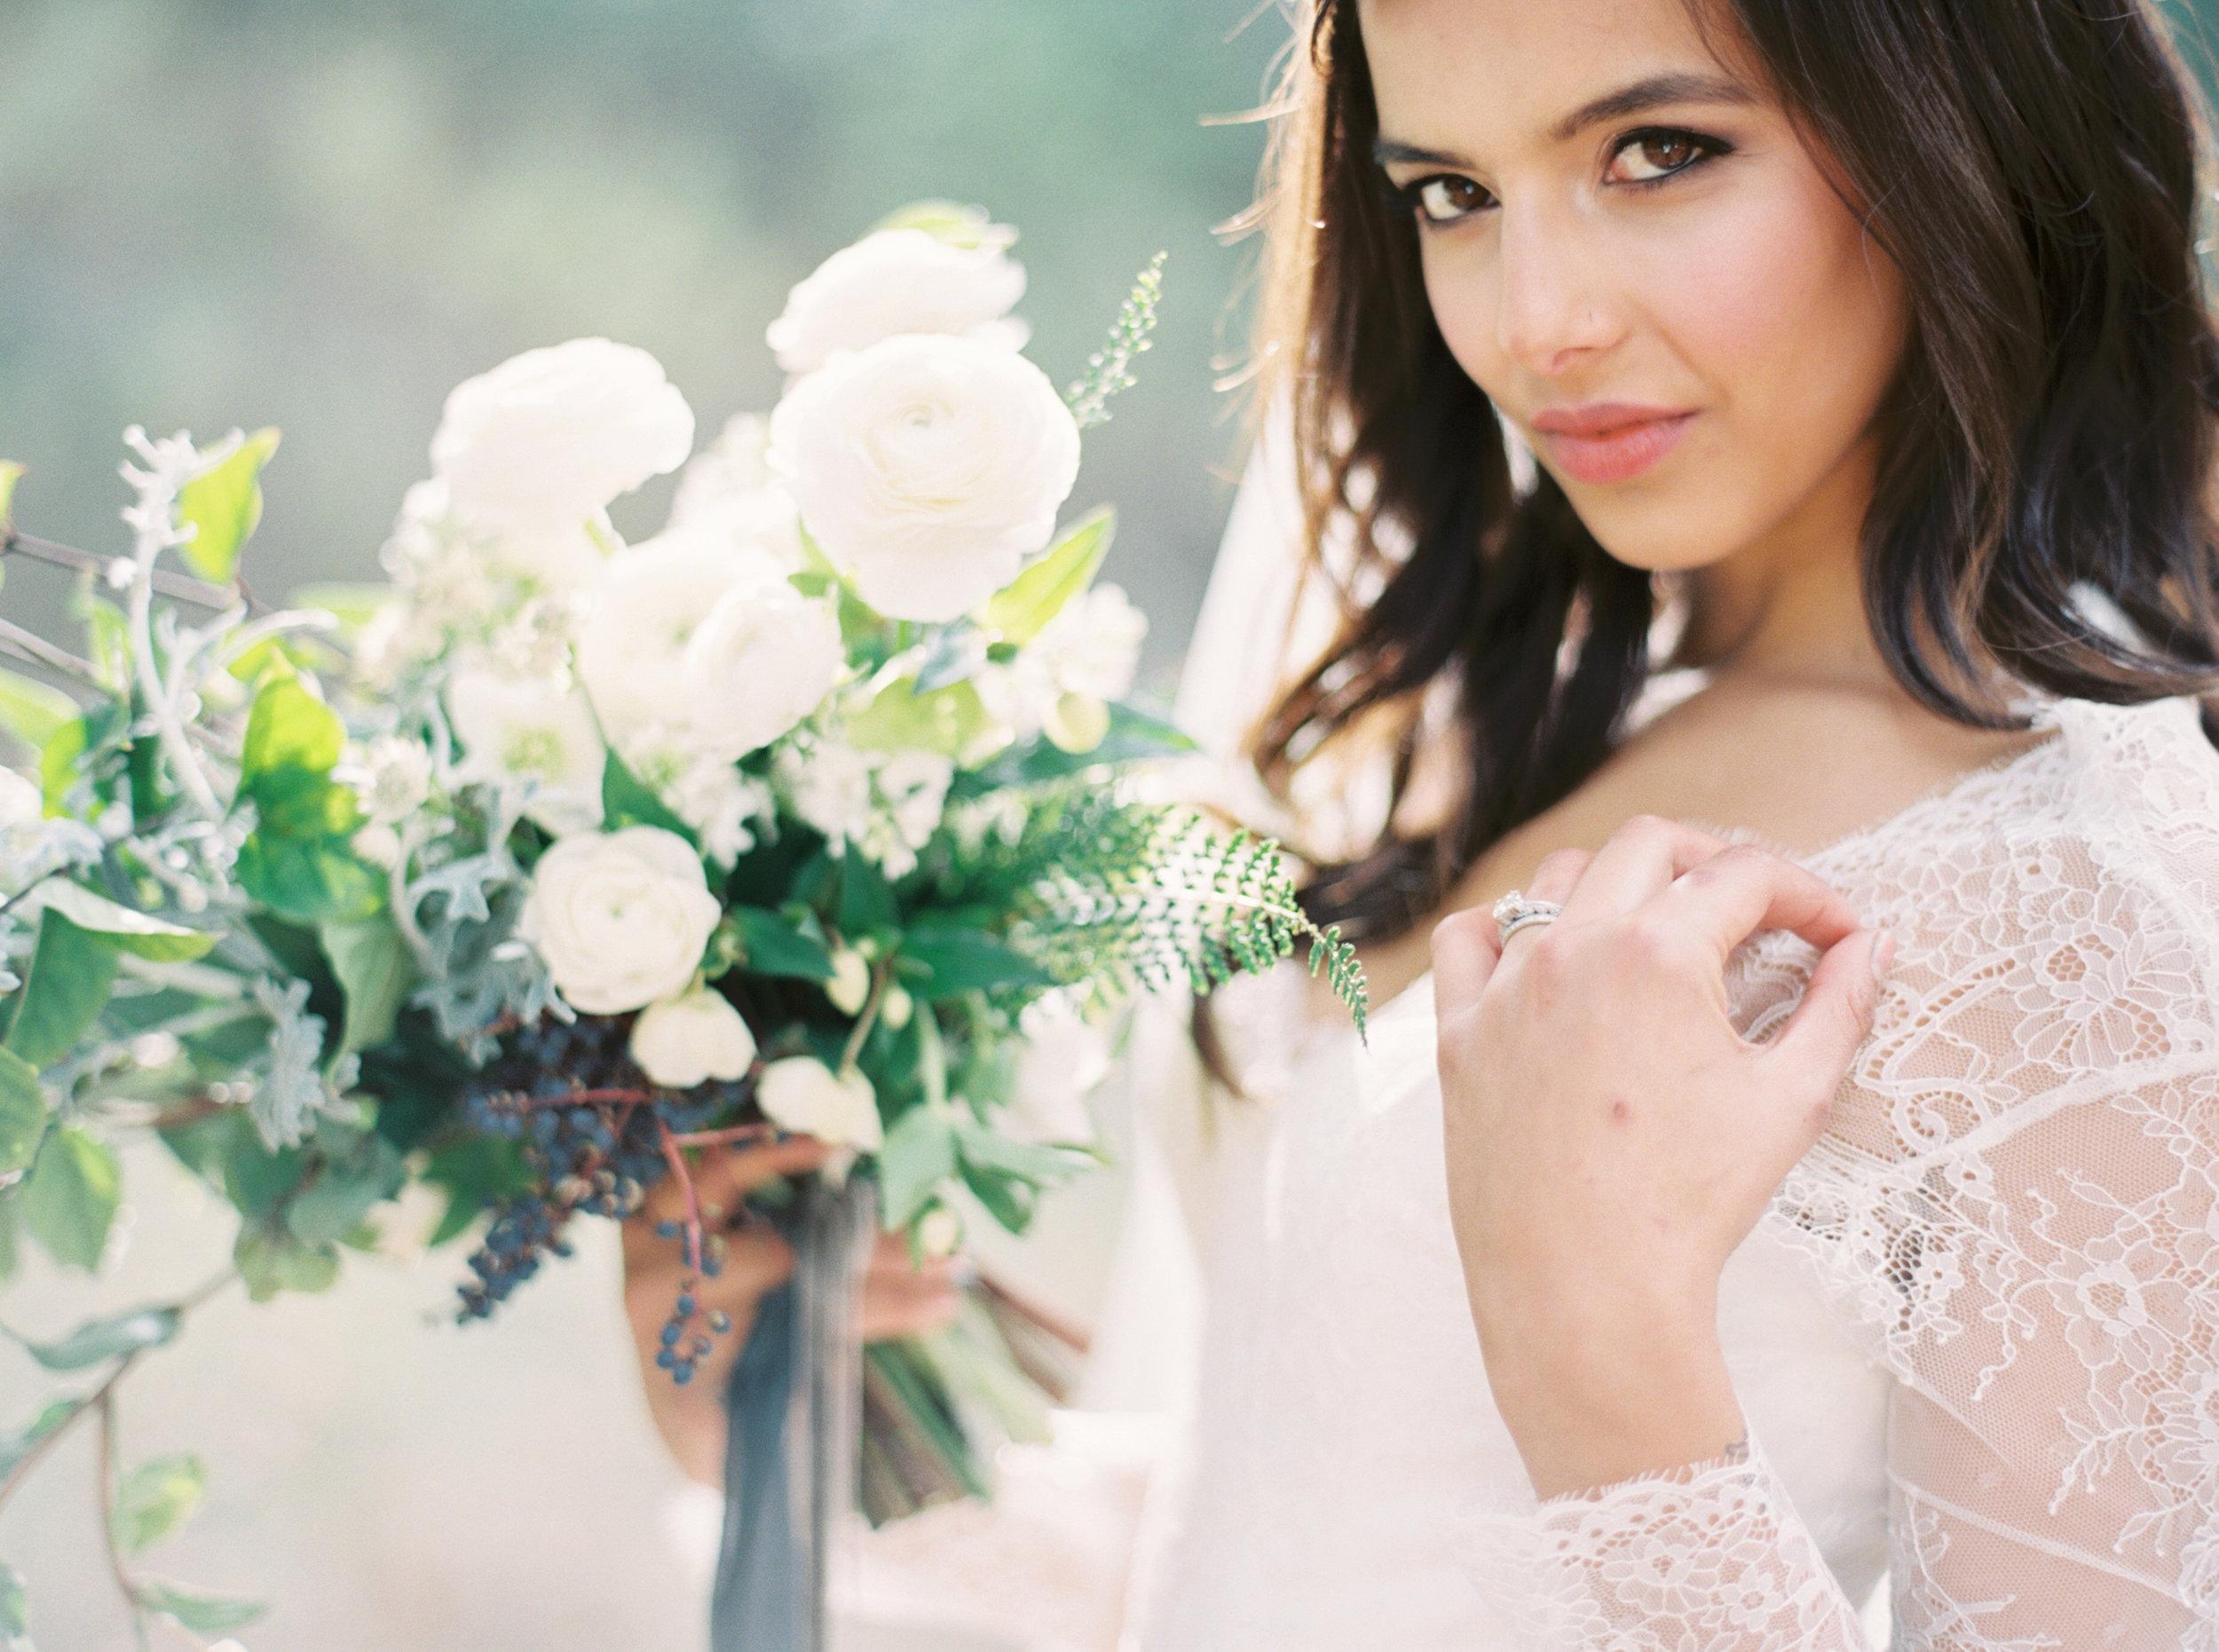 long-sleeve-lace-wedding-dress-19.jpg